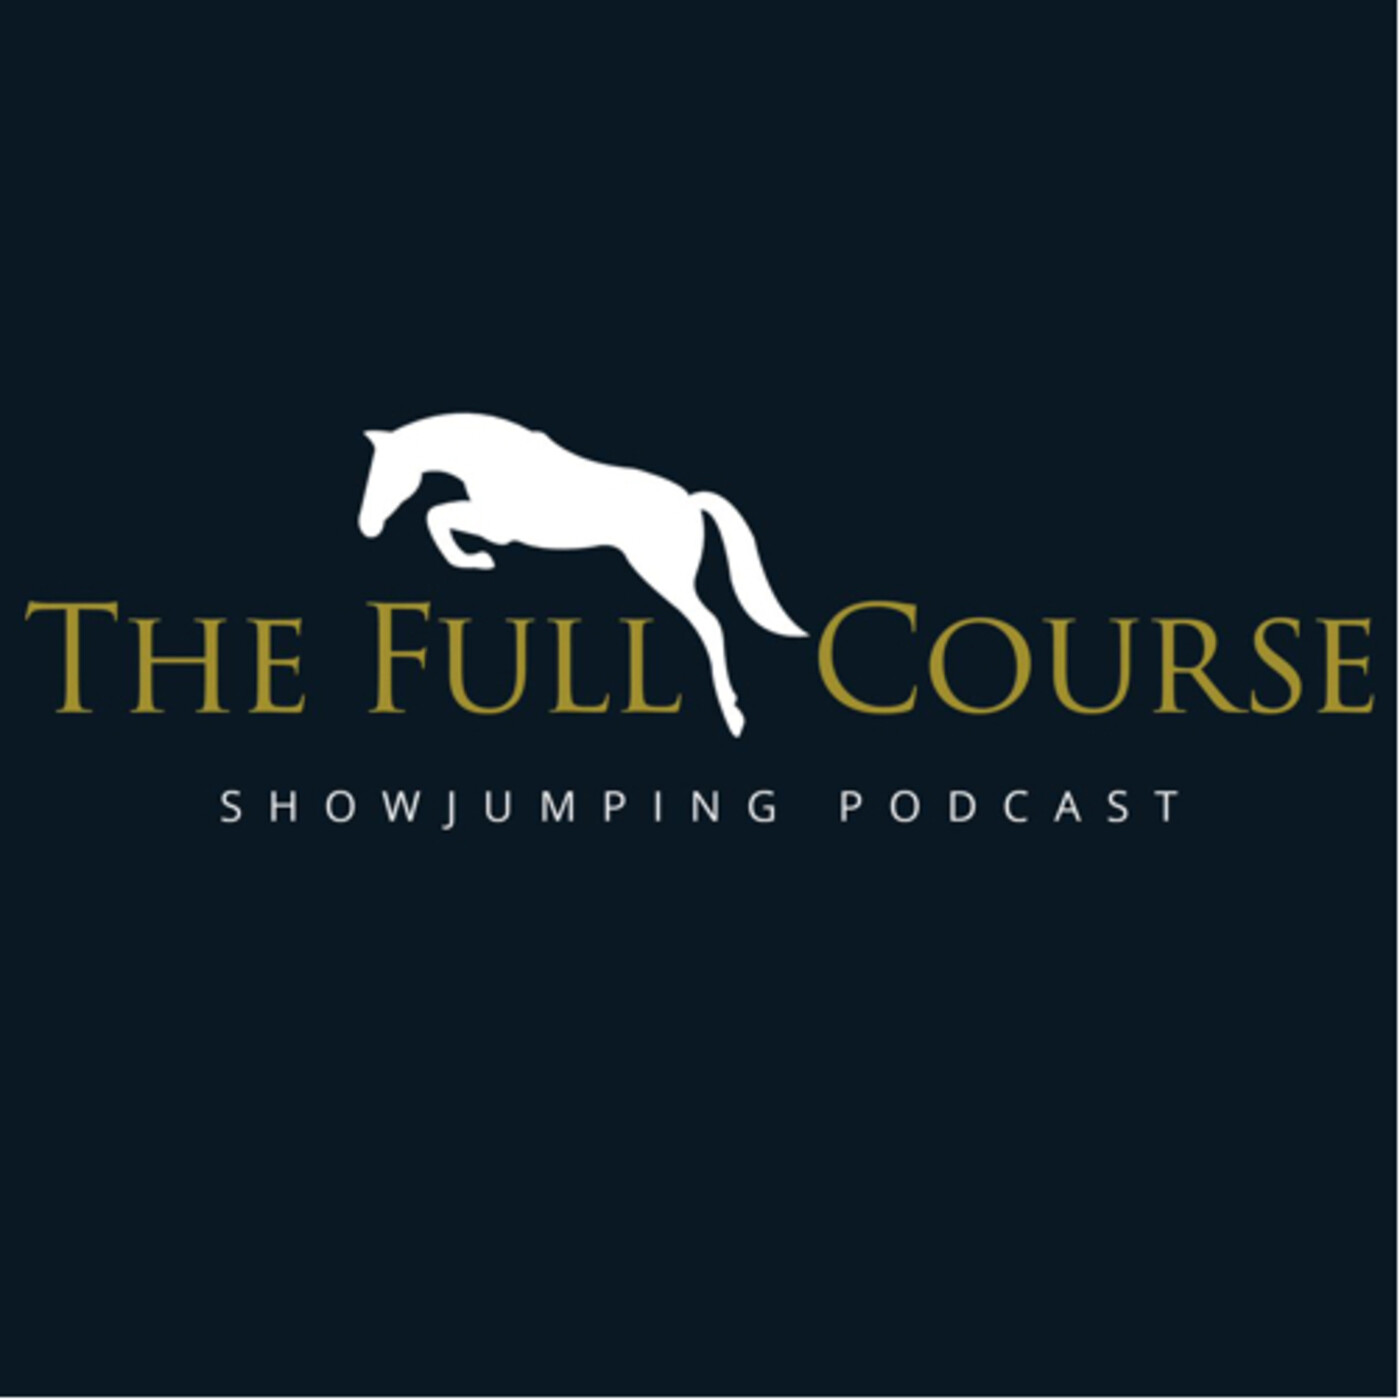 Amanda Derbyshire | Ep 28 | Full Course Showjumping podcast